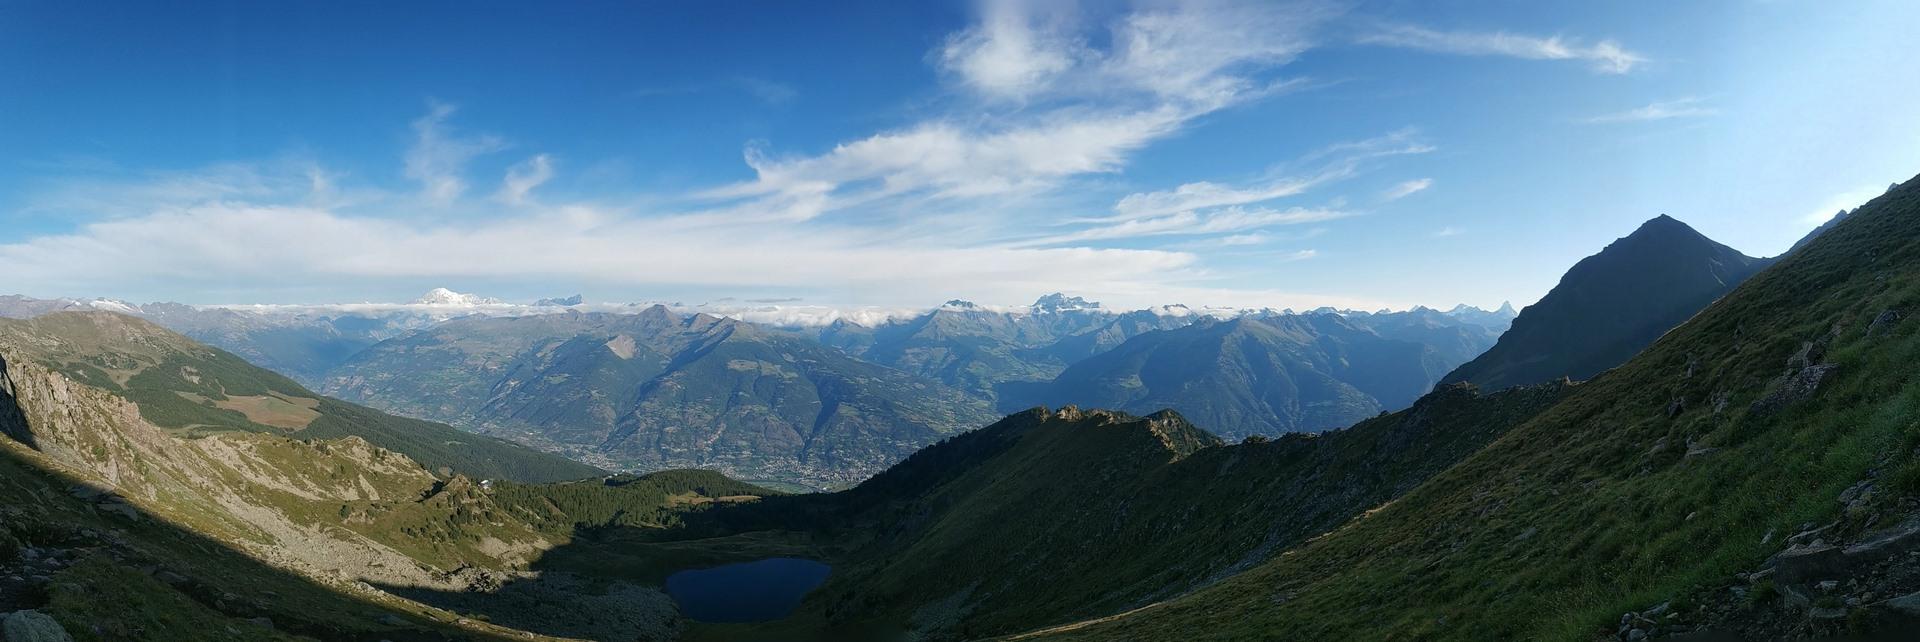 Od Mont Blanc poMatterhorn